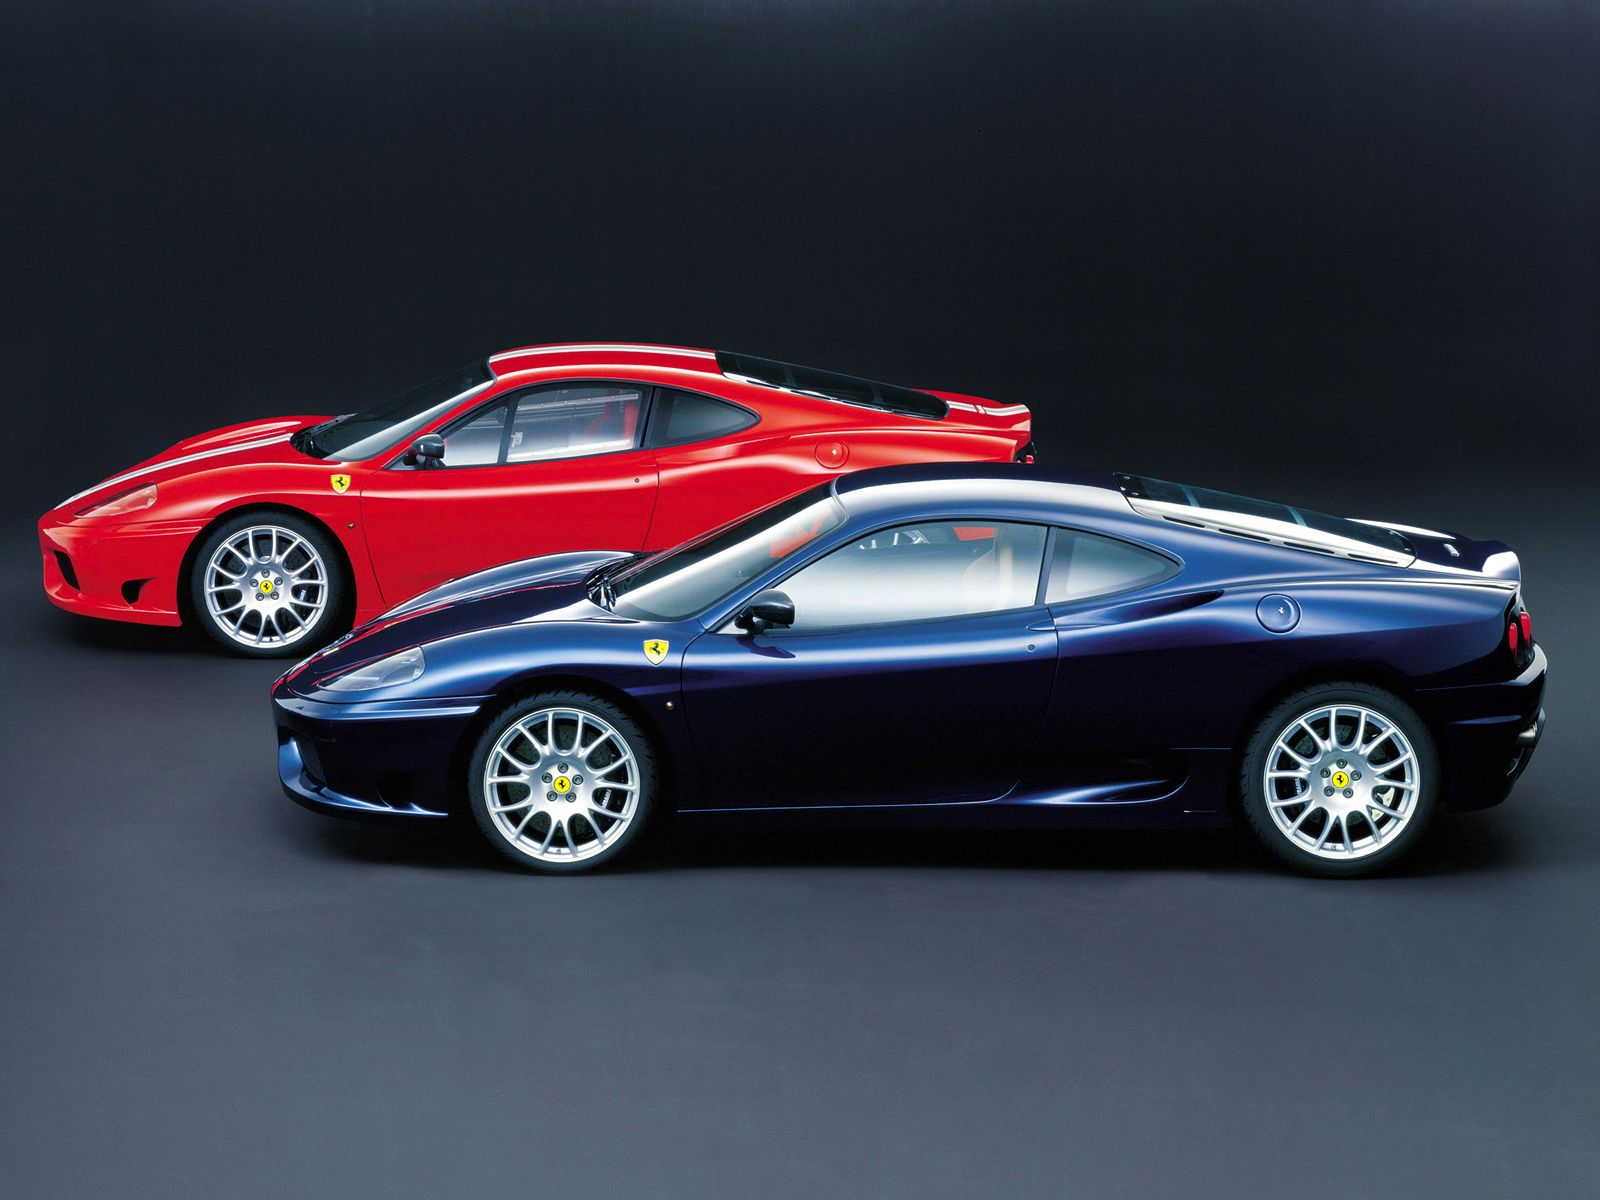 http://3.bp.blogspot.com/-CbQxRxSVD0g/TekaTp0xtrI/AAAAAAAAAVA/I7X740lV9C8/s1600/Ferrari+360+Modena+Wallpapers-4.jpg